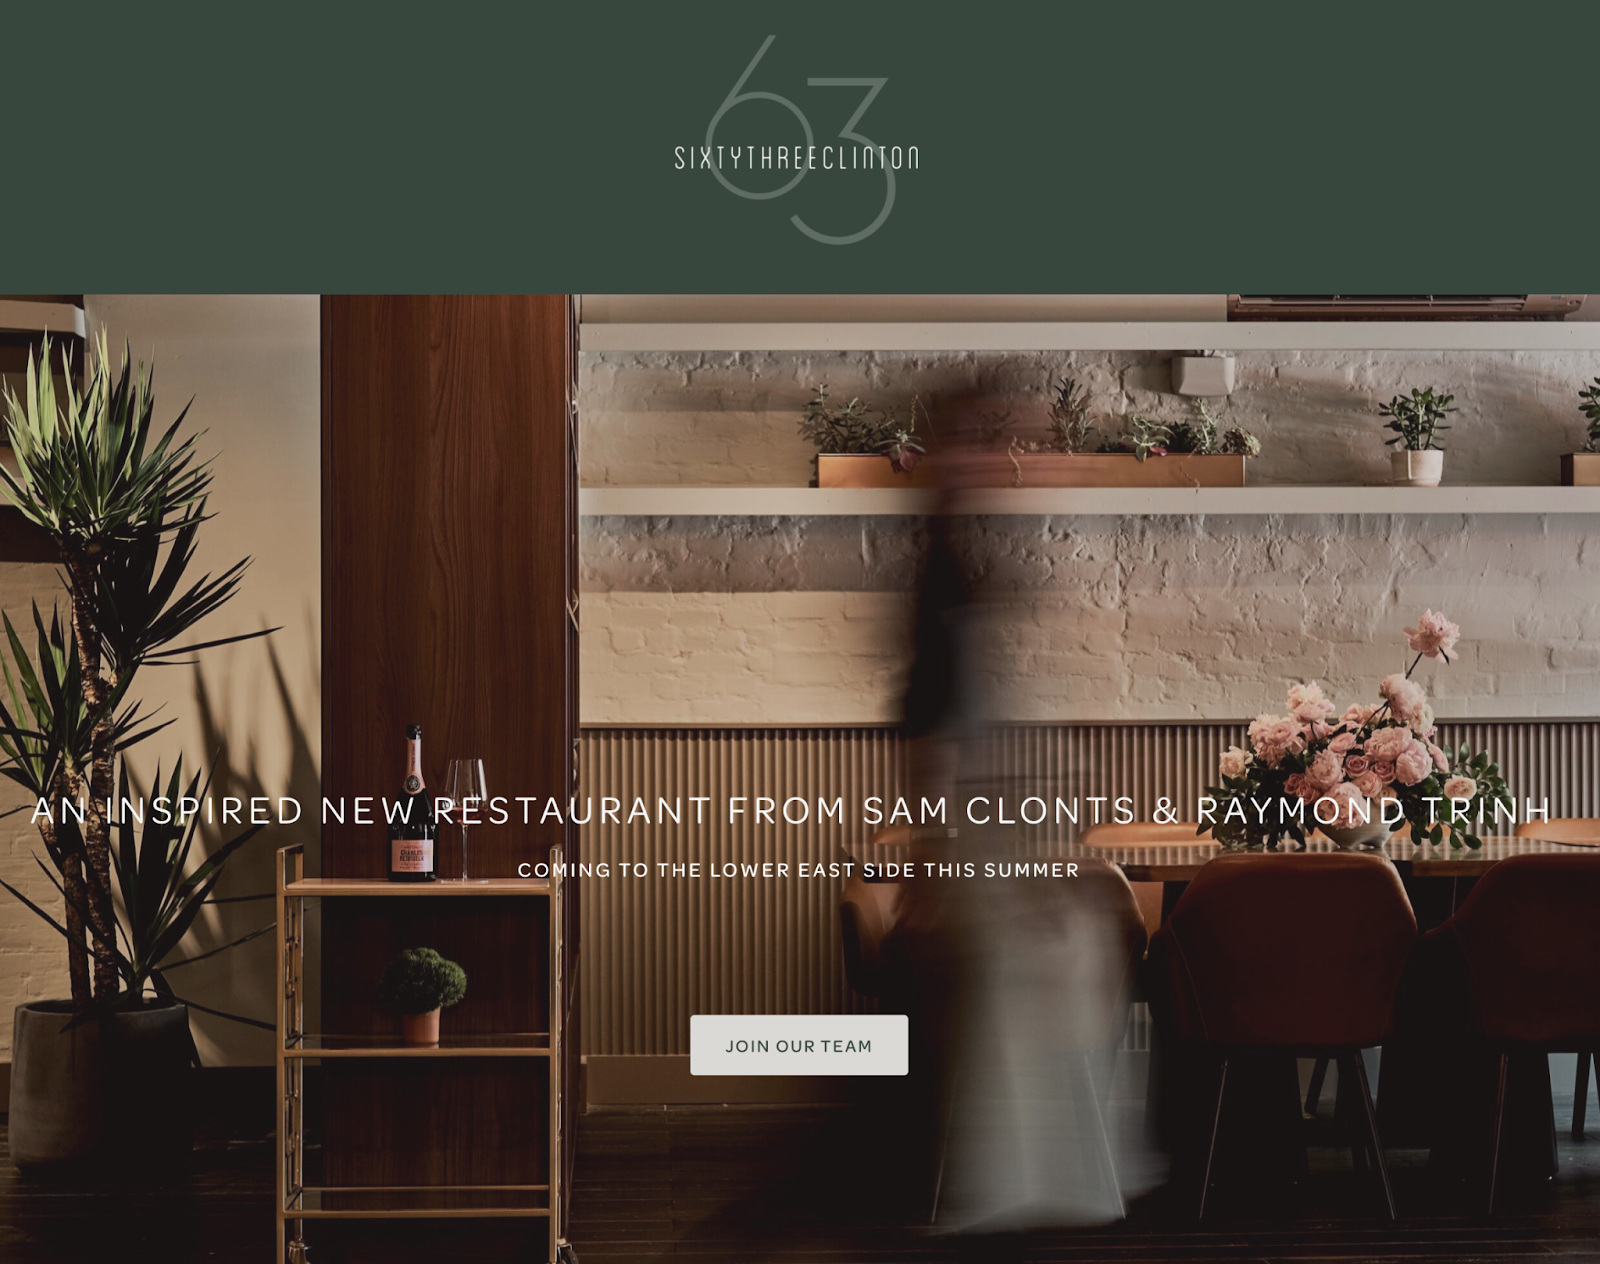 63 Clinton - good restaurant website design example